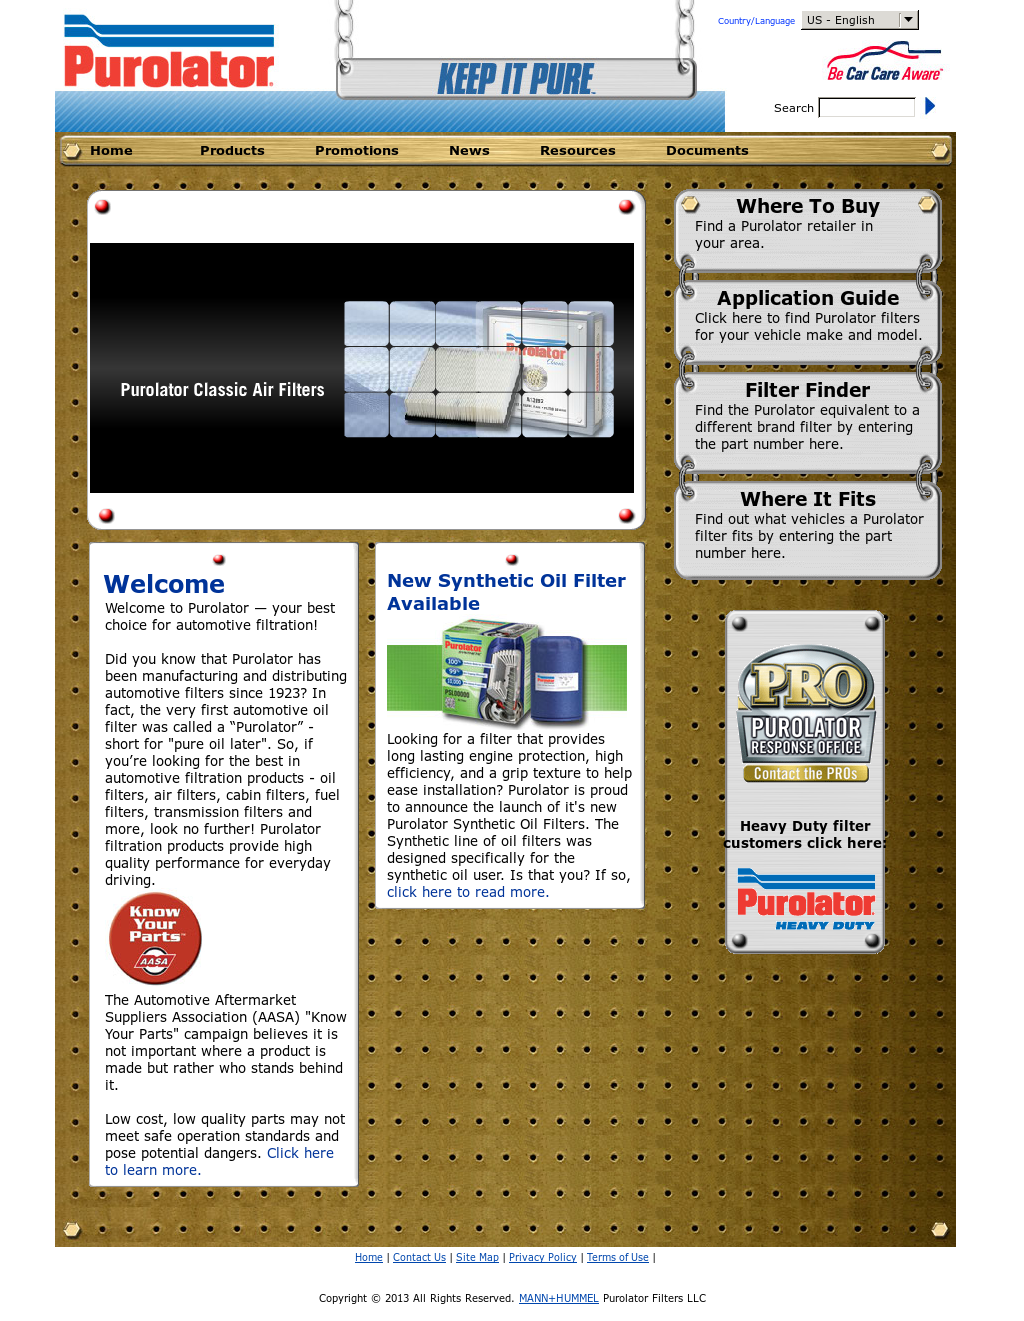 Purolator Filters Competitors Revenue And Employees Owler Company Fuel Profile